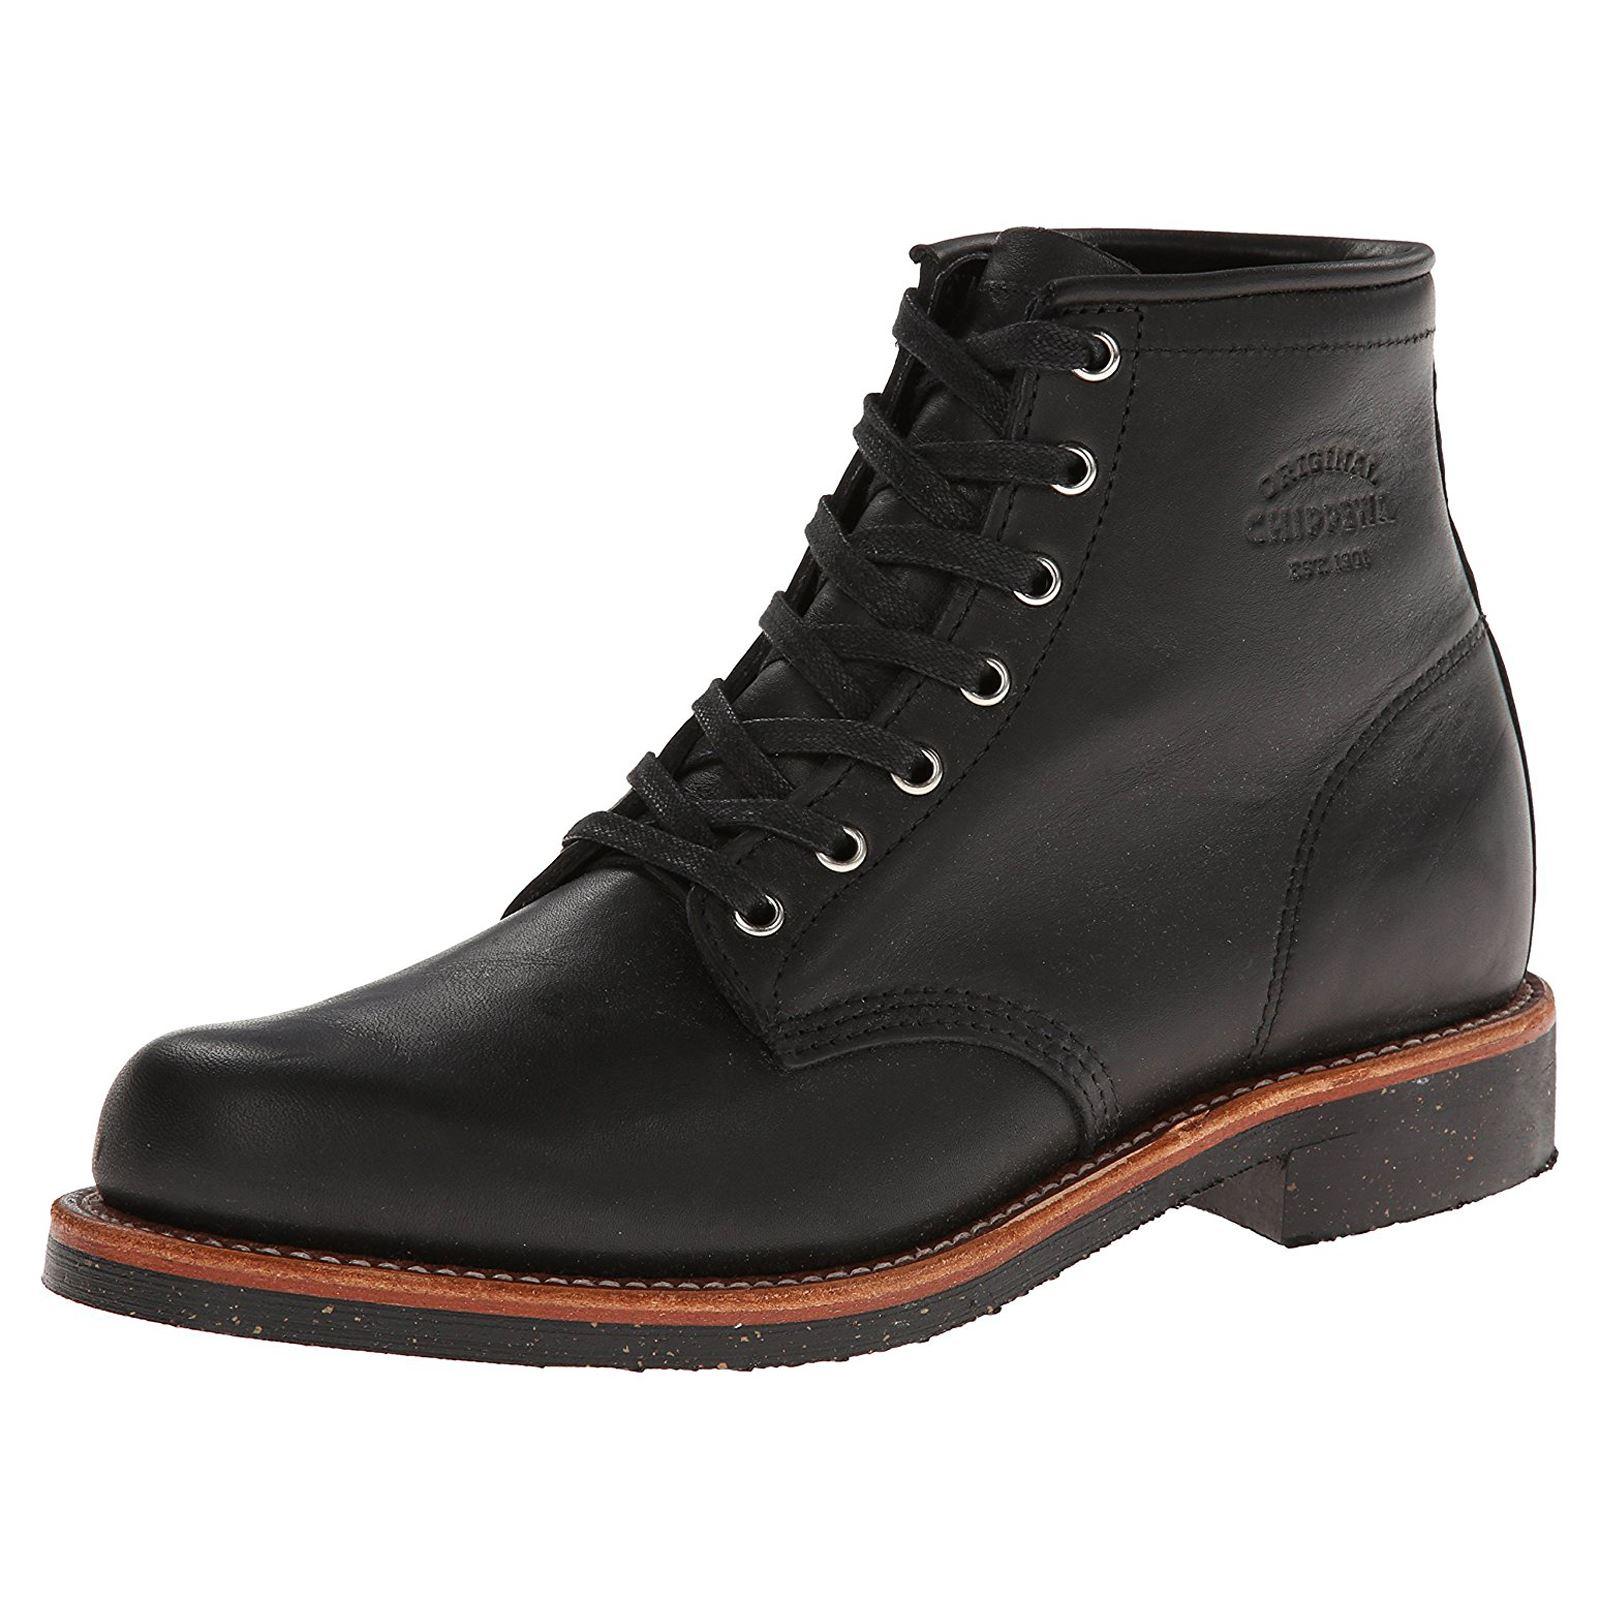 Chippewa 1901m24 Black Men Plain Toe Odessa Leather